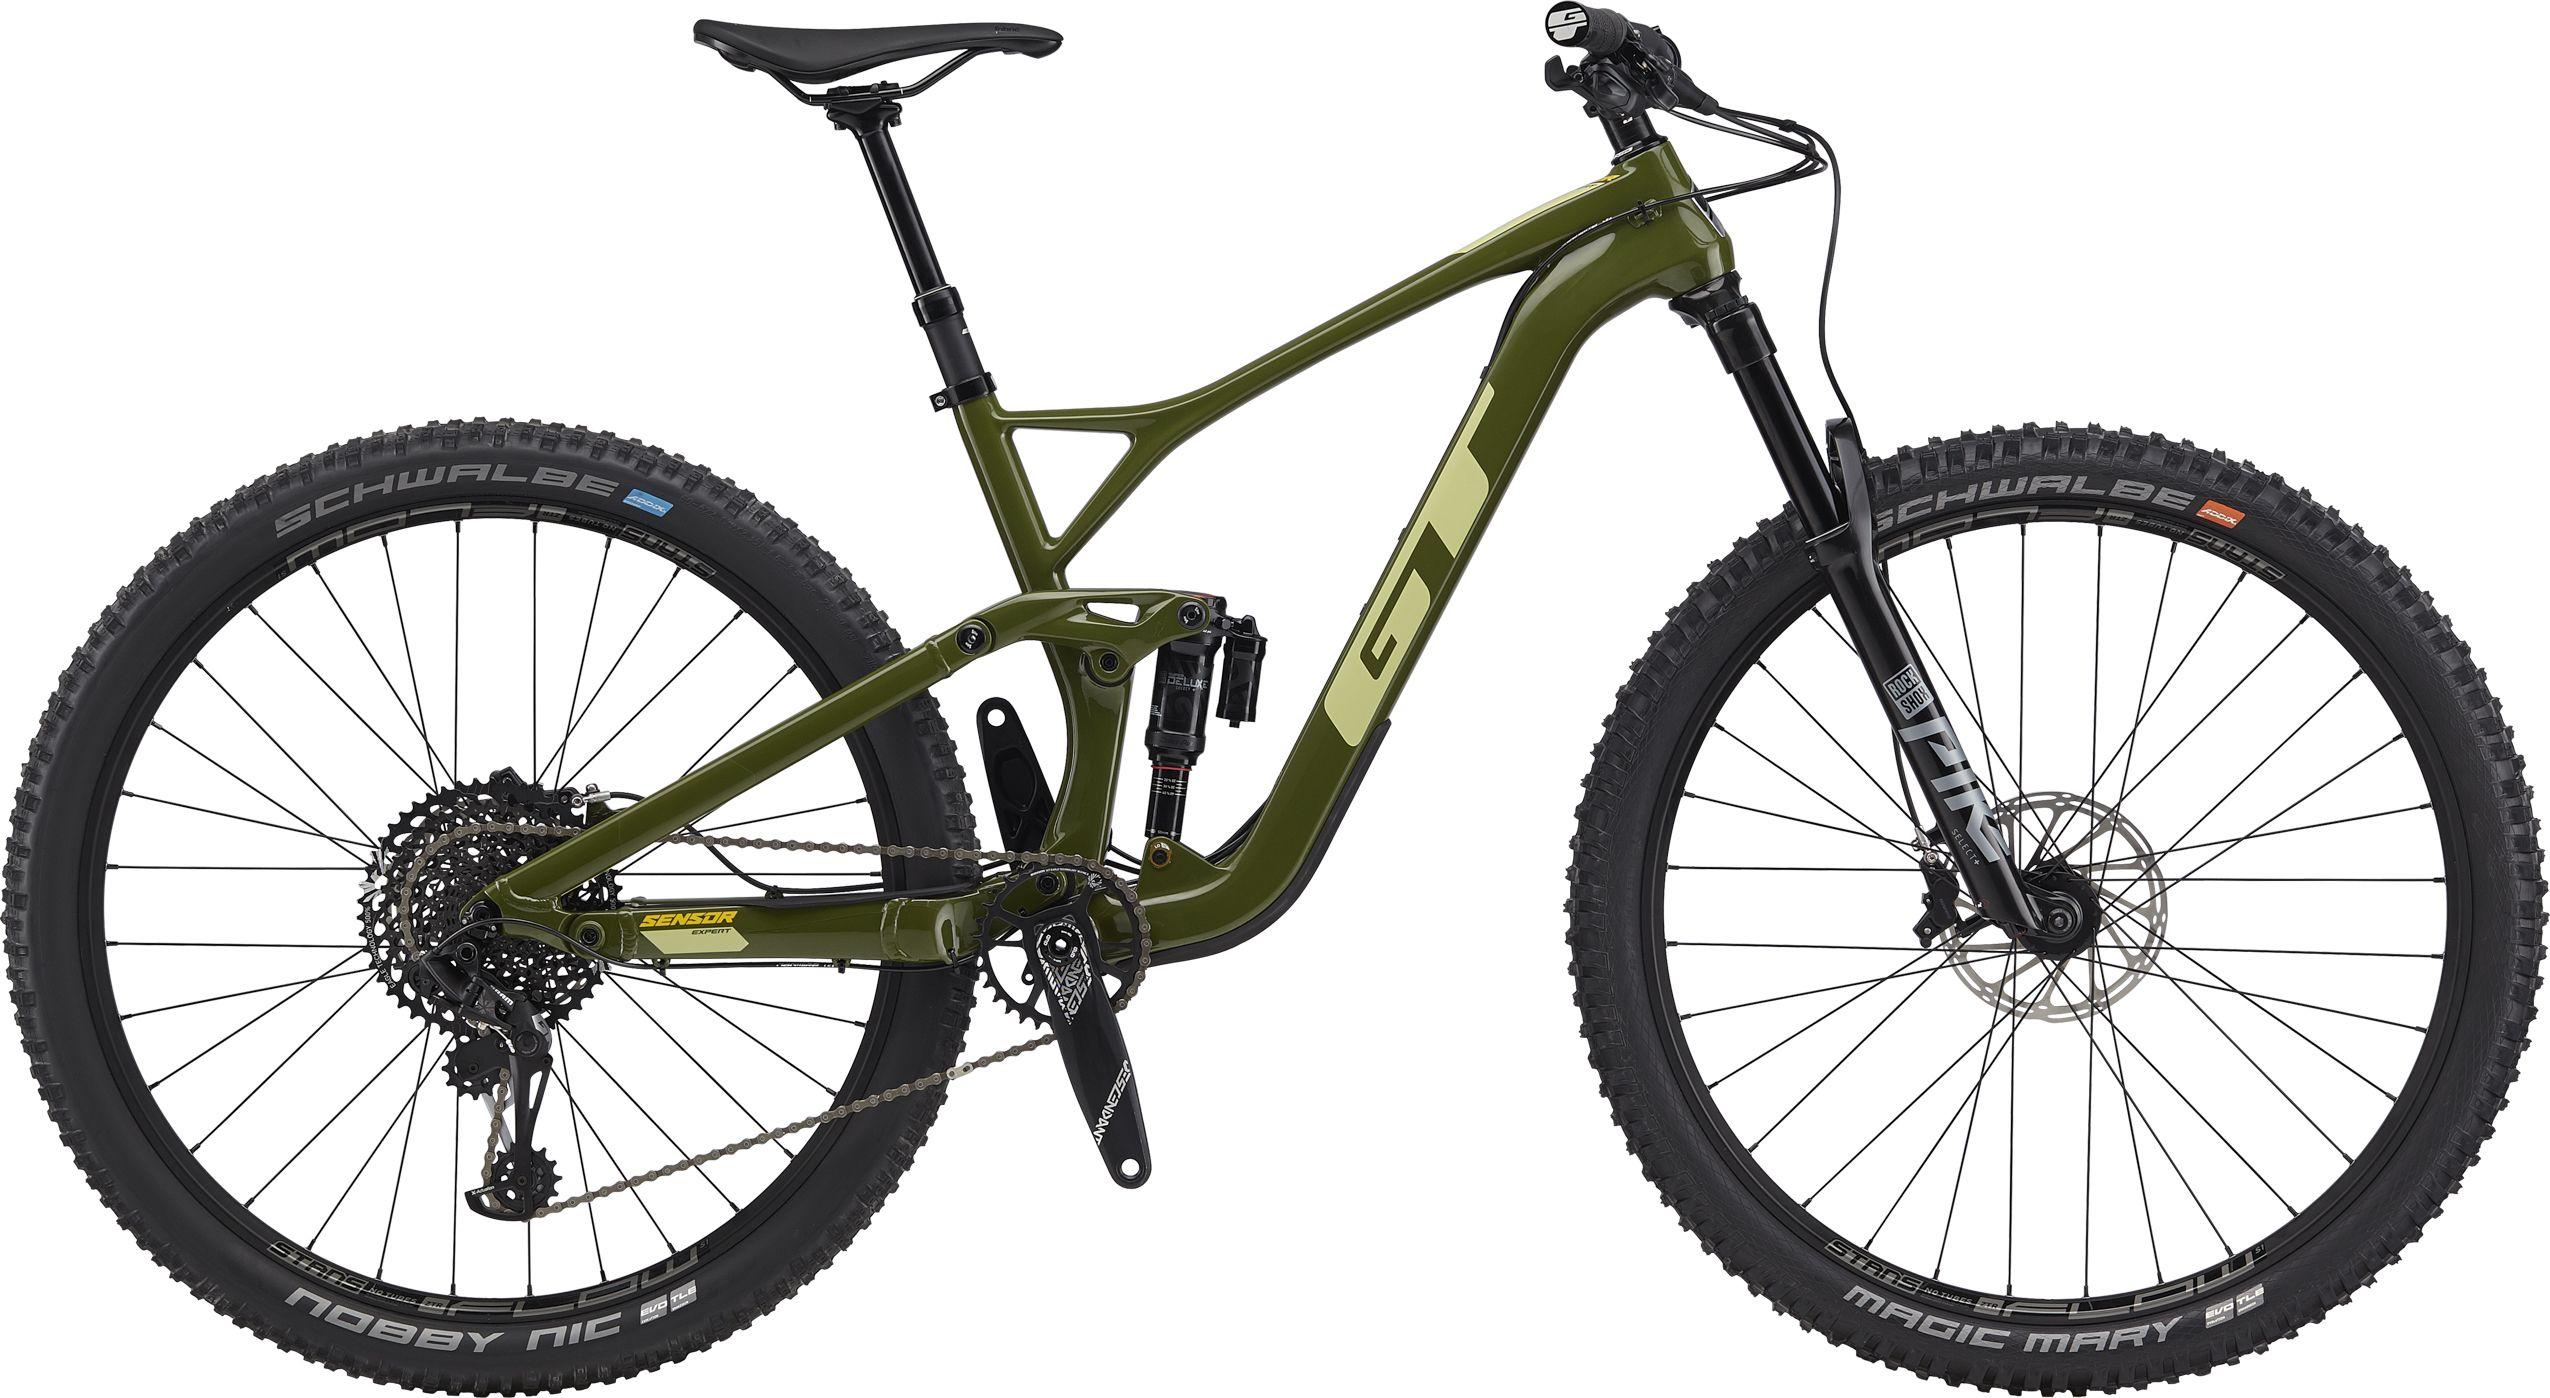 Gt Sensor Carbon Expert 29er Mountain Bike 2020 | Mountainbikes